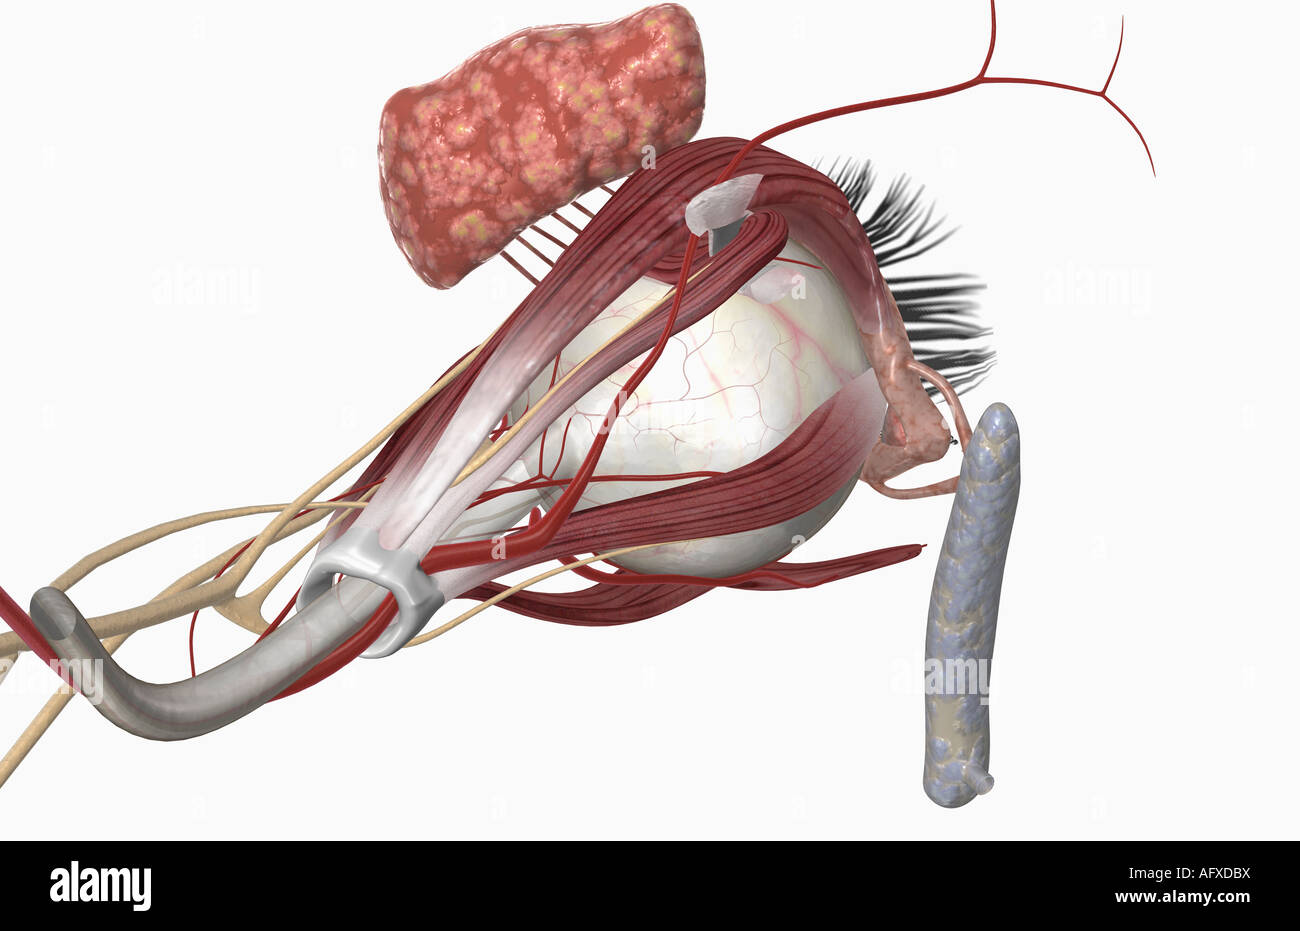 Medial Rectus Muscle Stockfotos & Medial Rectus Muscle Bilder - Alamy